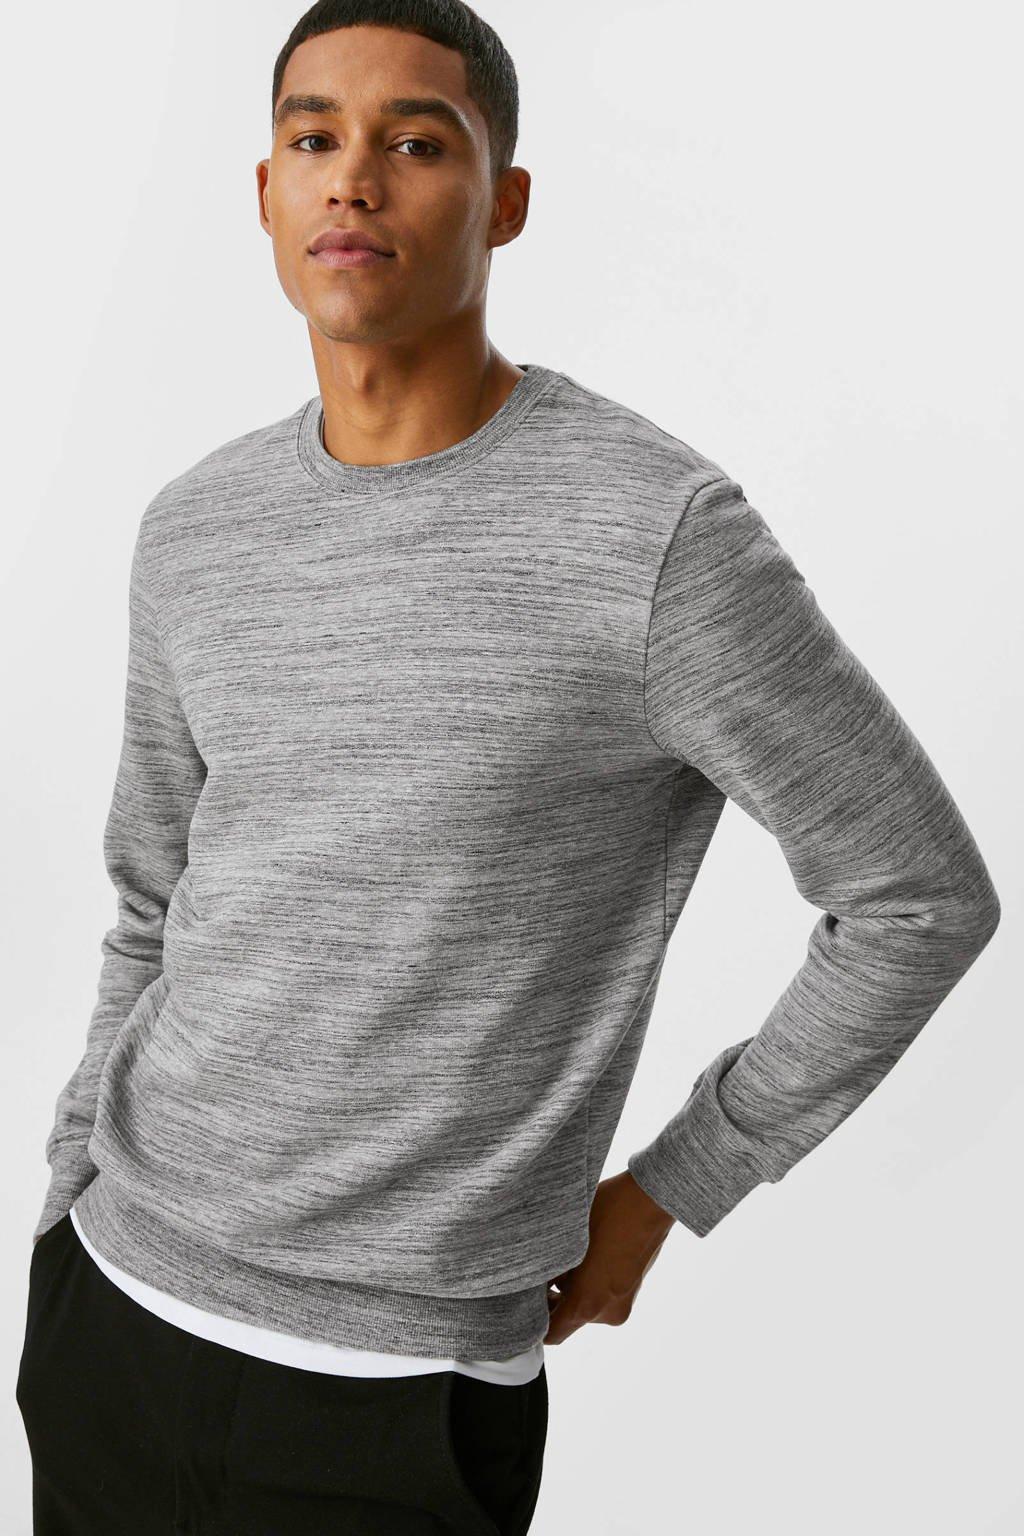 C&A Clockhouse gemêleerde sweater grijs, Grijs